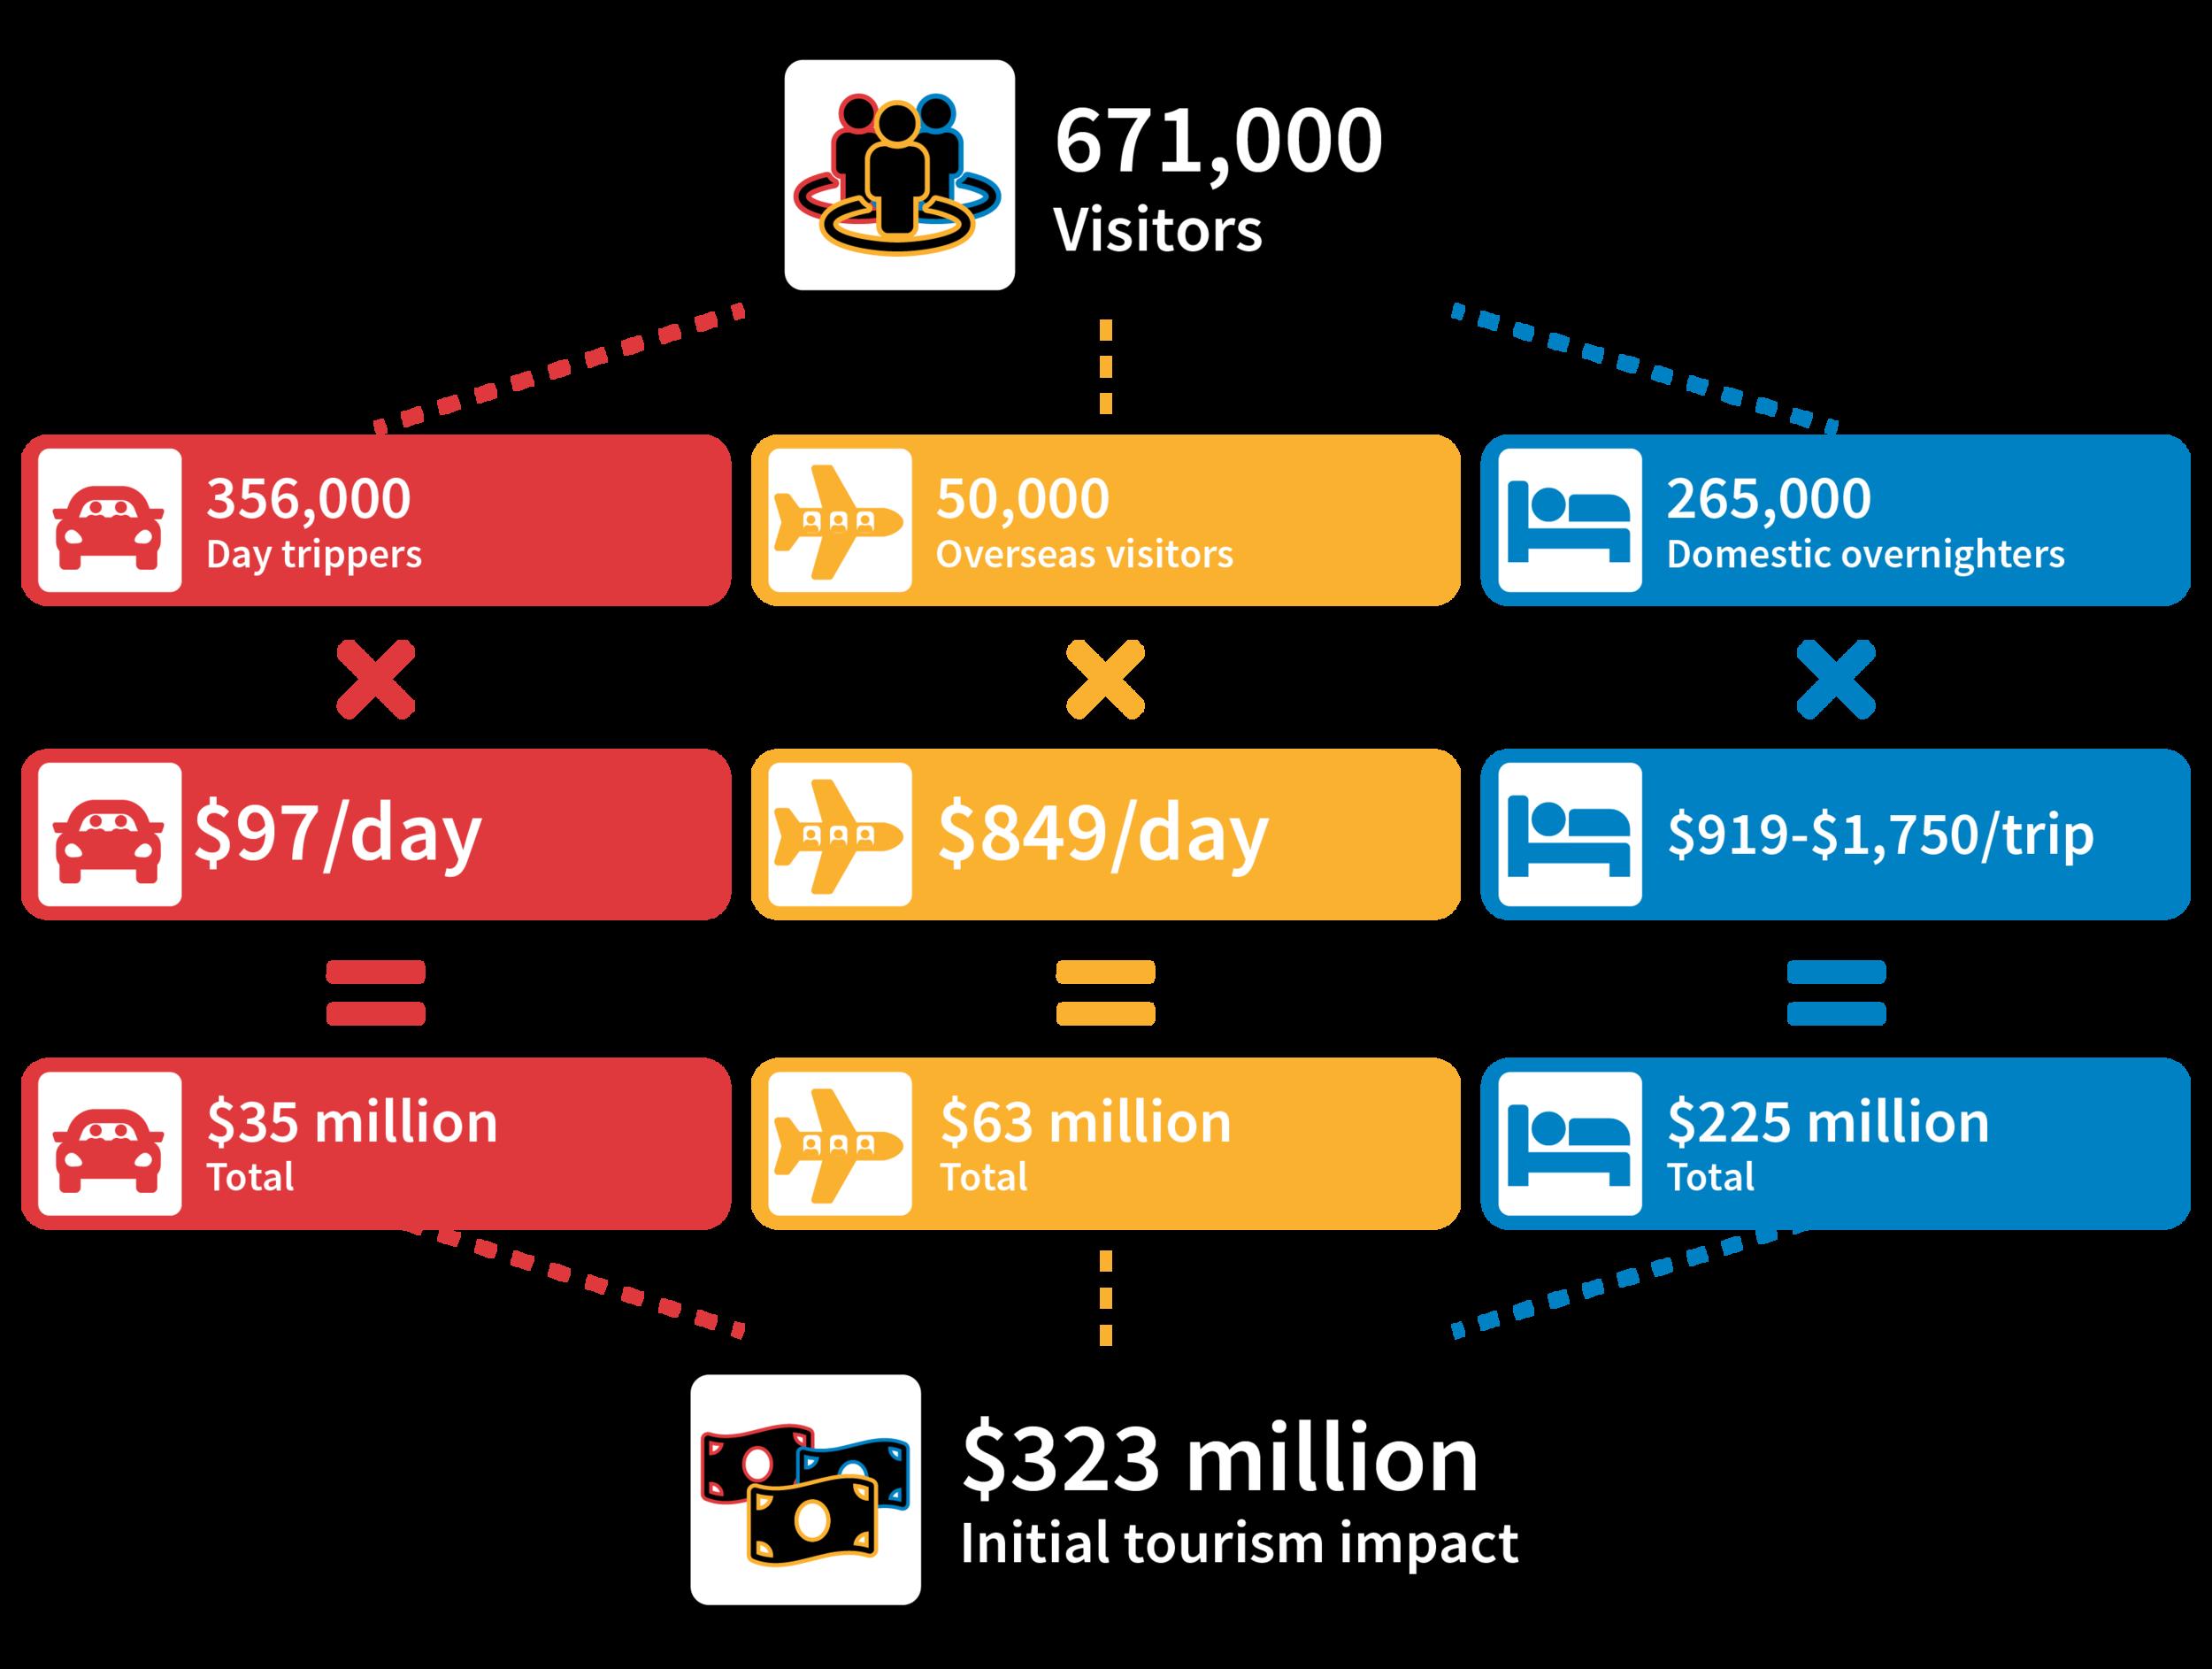 Figure 1: Estimated Tourism Impact   [1] Data source: Griffith University